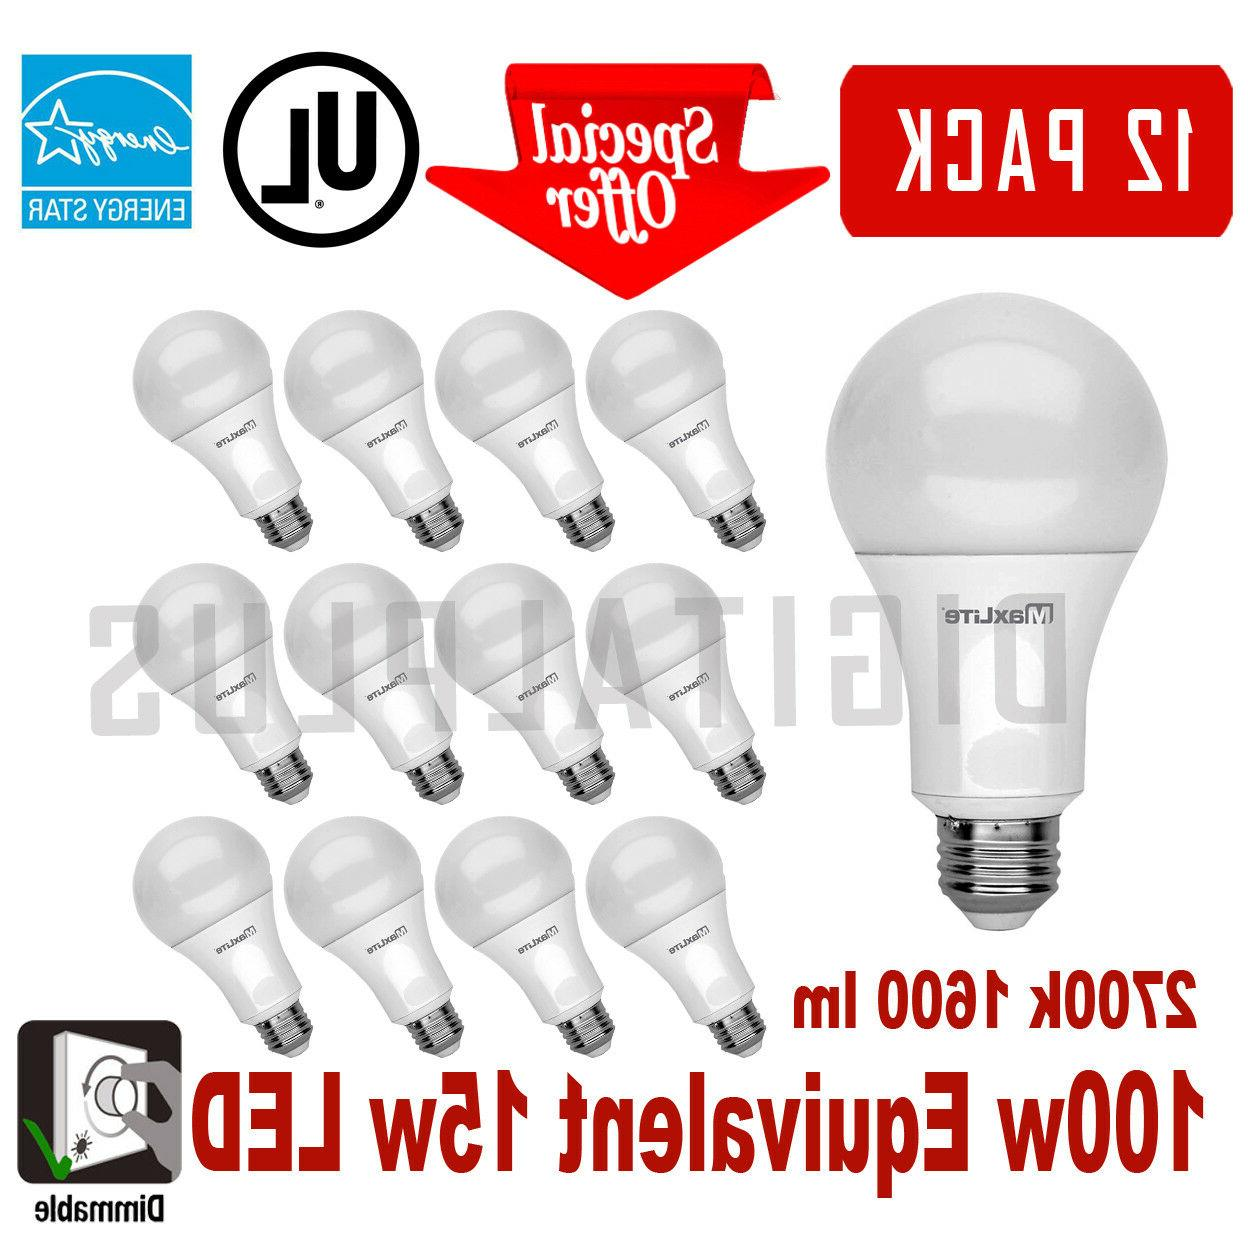 12 LED Light Bulbs MAXLITE 1600 Soft E26 Dimmable